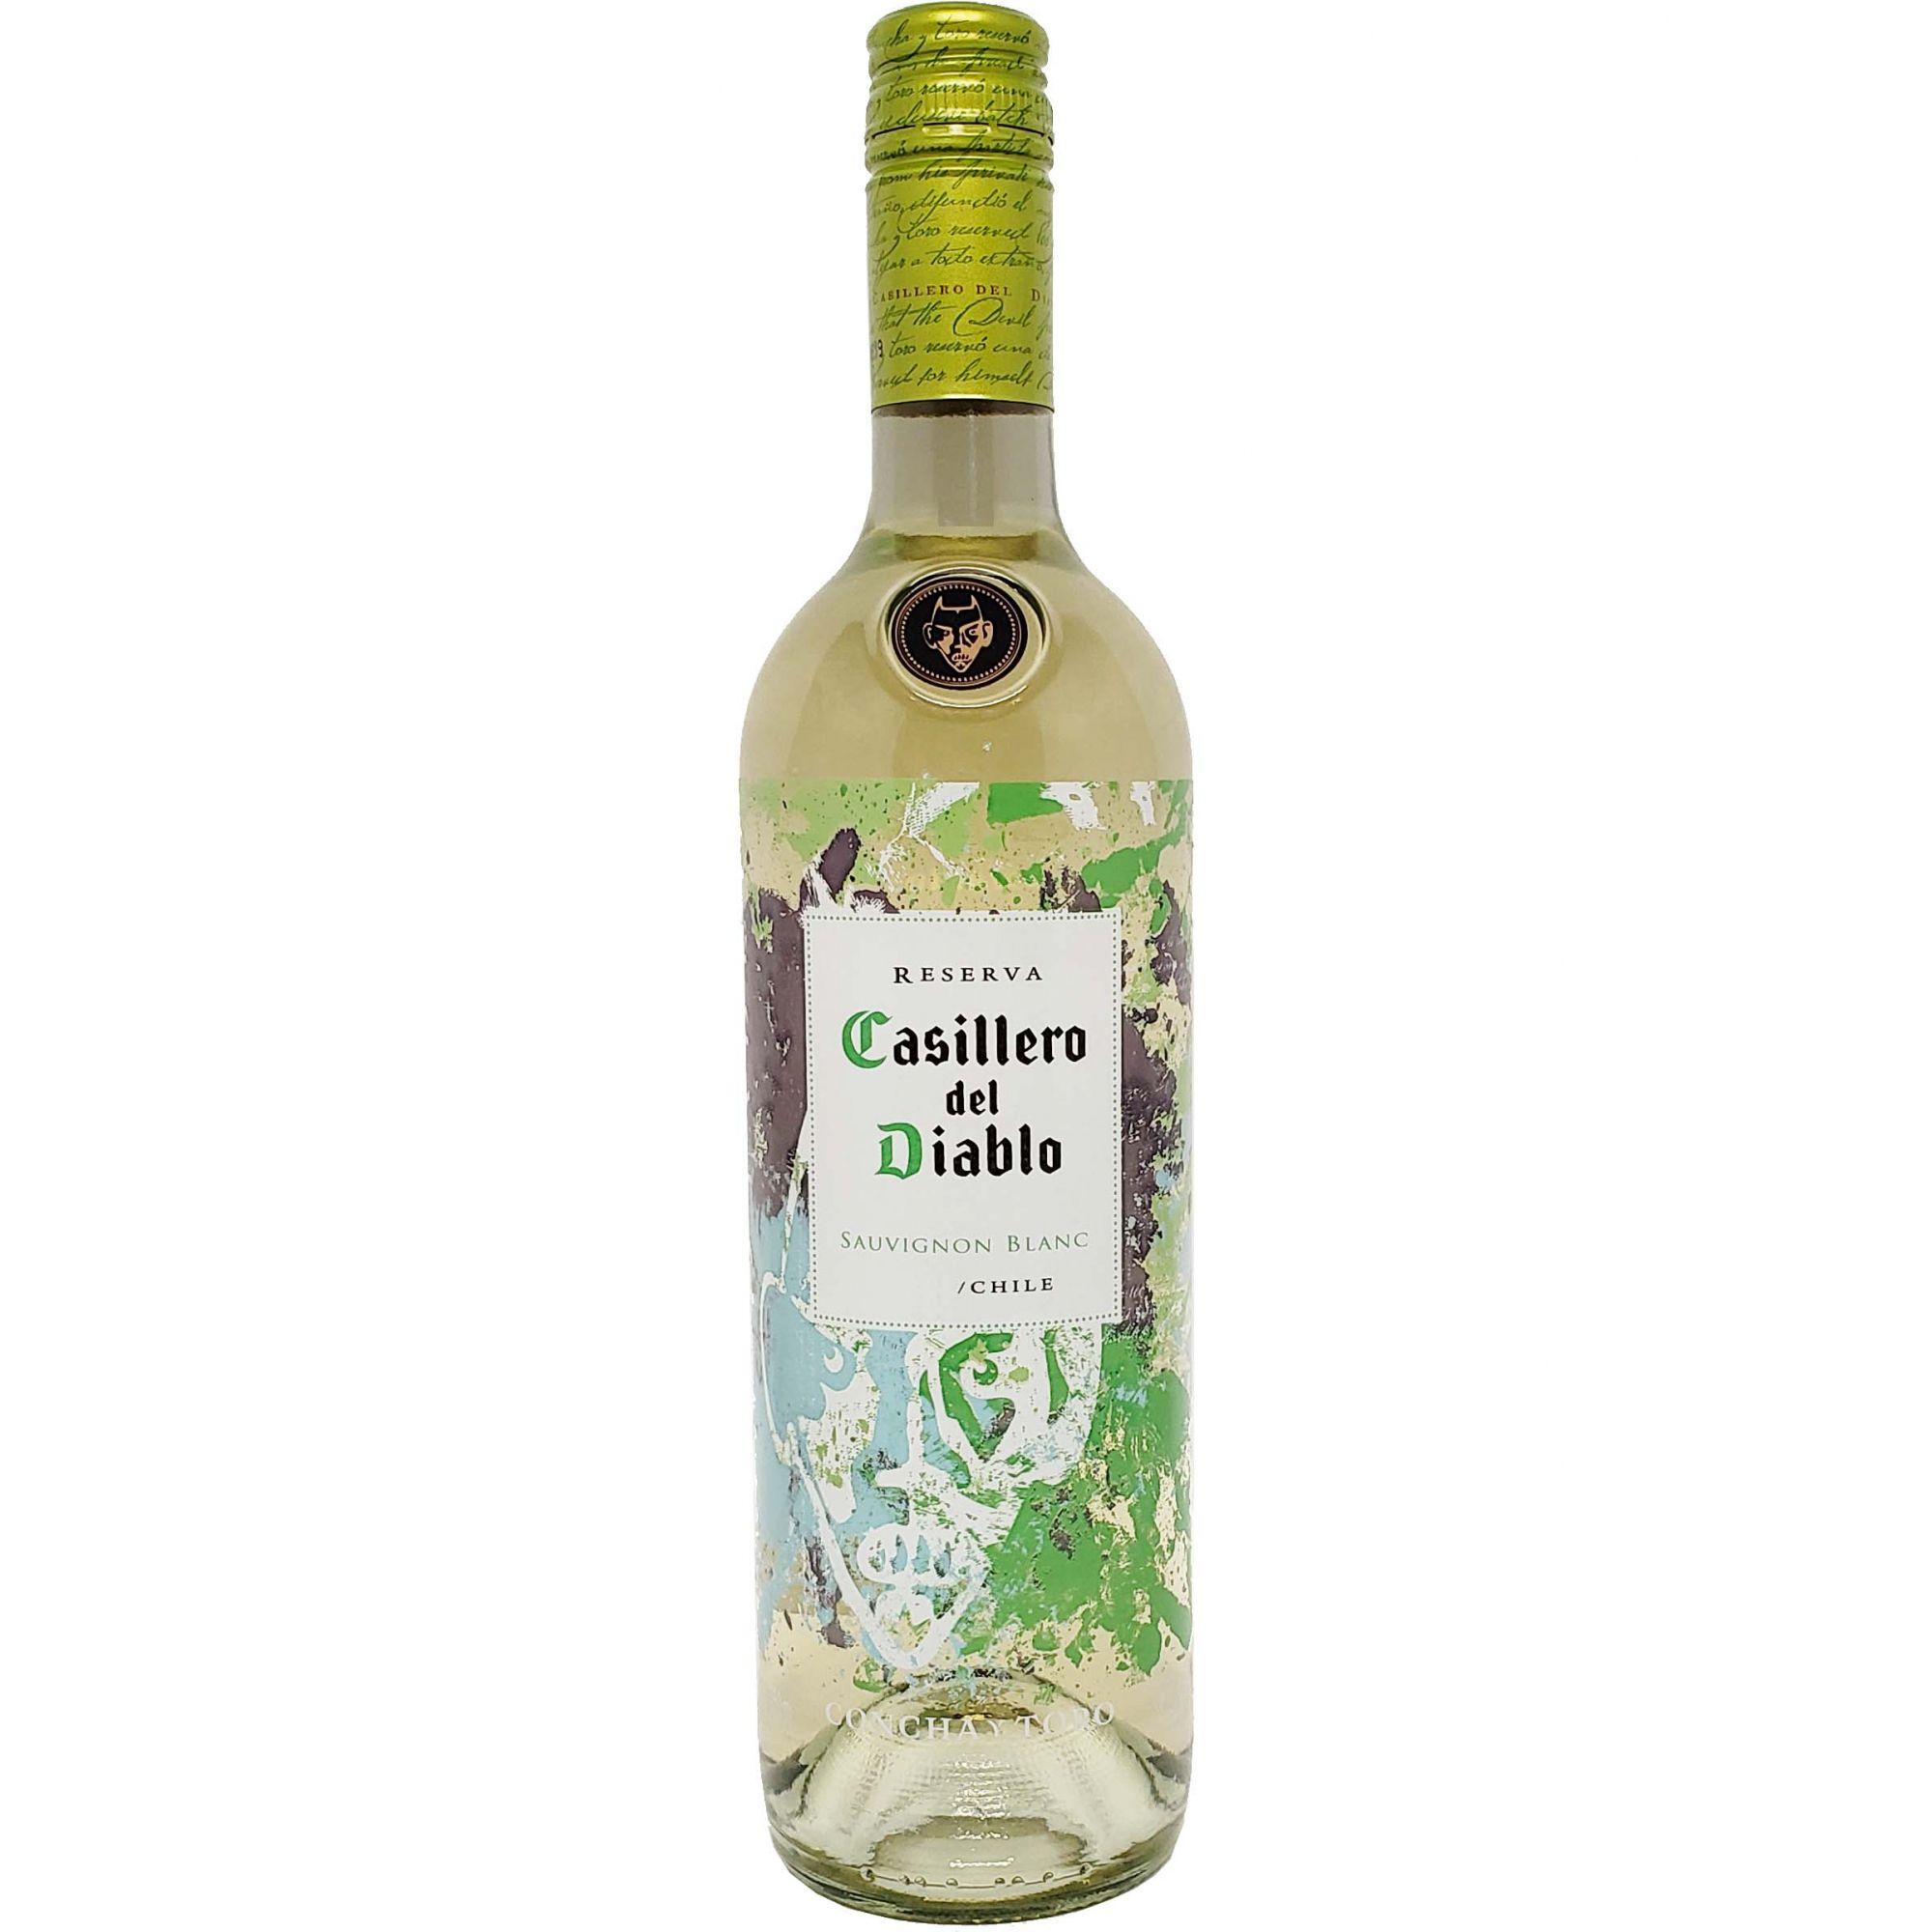 Vinho Branco Casillero del Diablo Sauvignon Blanc Reserva  - 750ml -